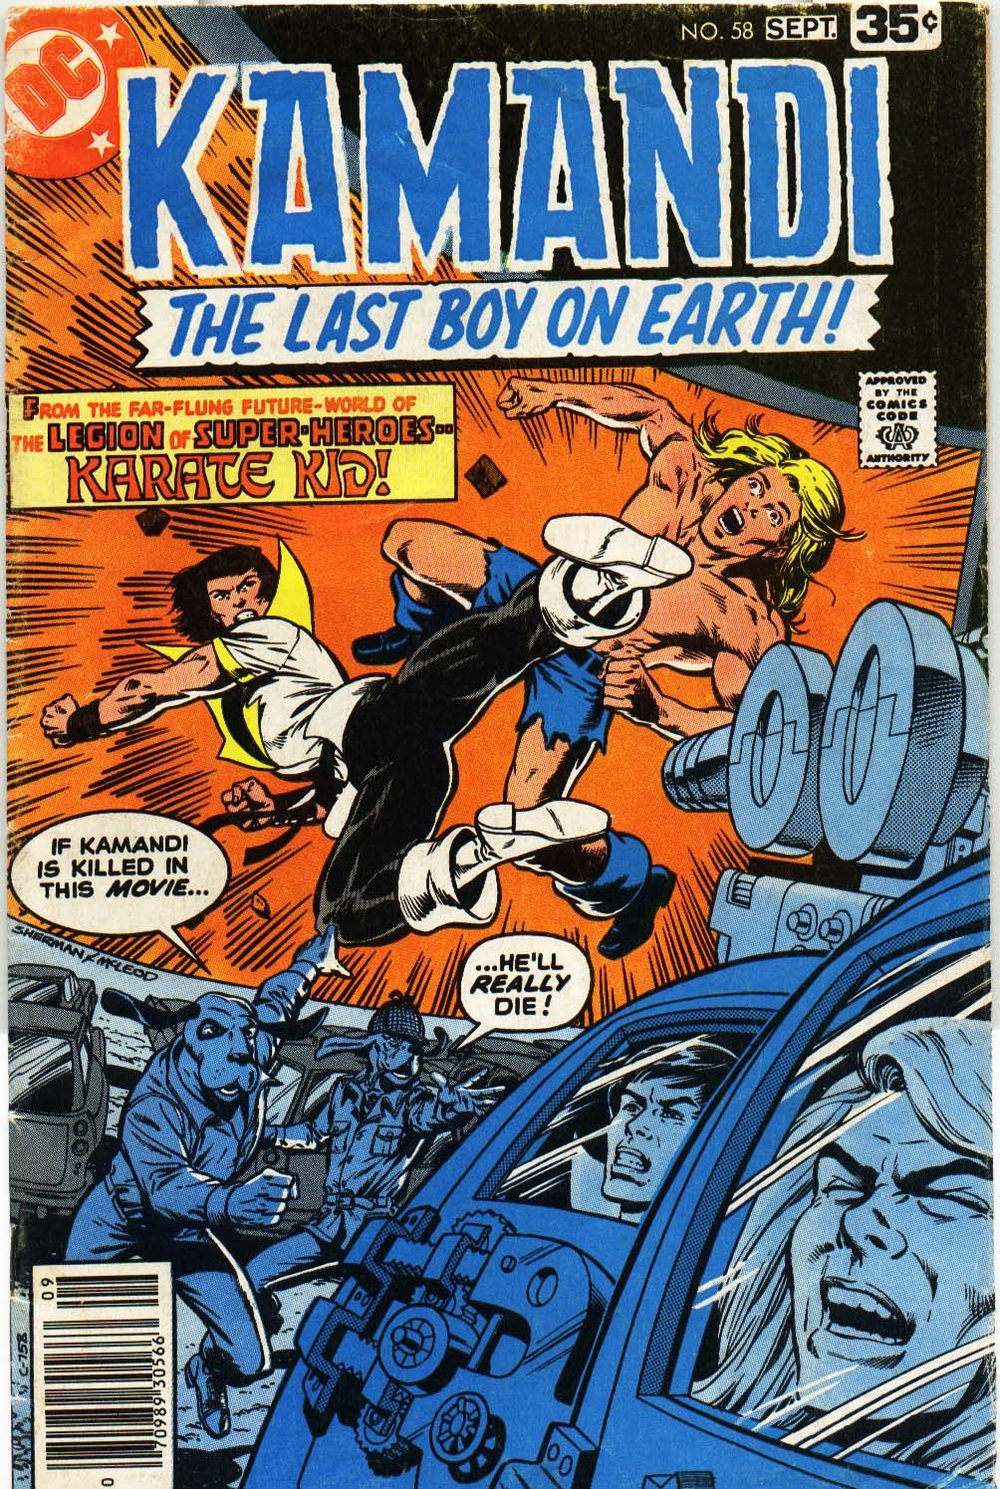 Kamandi (1975) #58, cover penciled by Jim Sherman & inked by Bob McLeod.